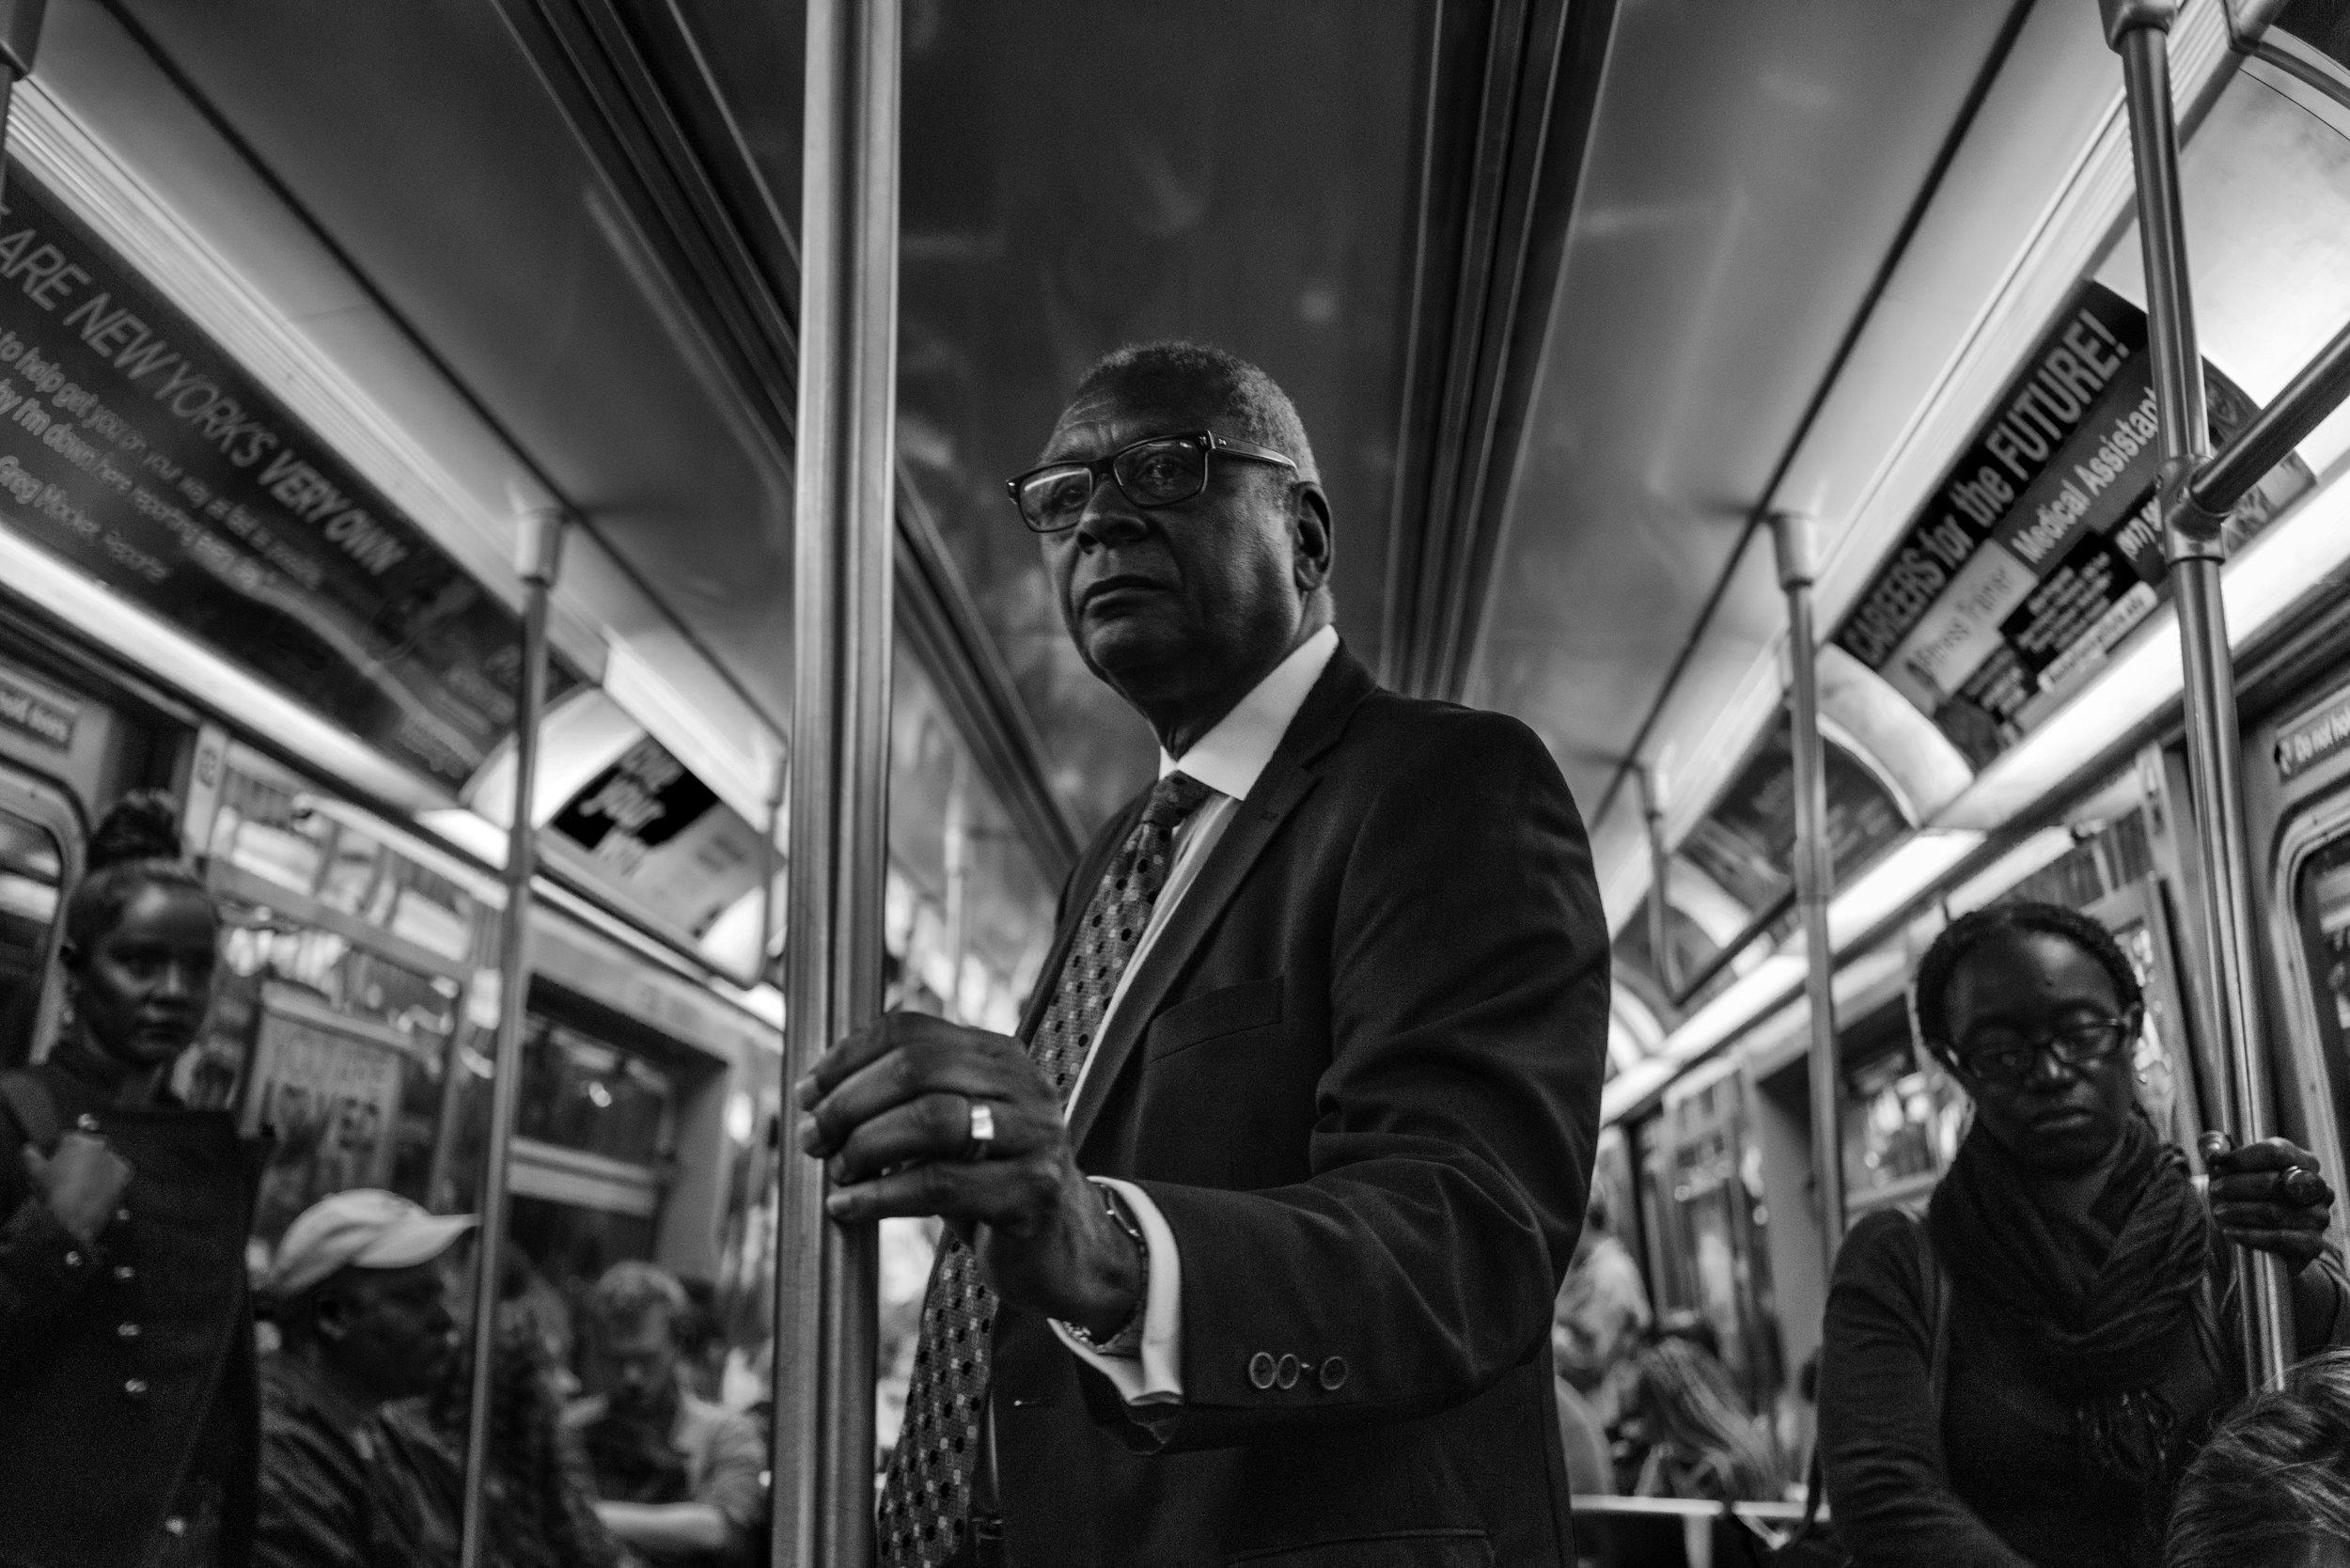 Brklyn_Subway_2018_Distinguished_Businessman-002.jpg